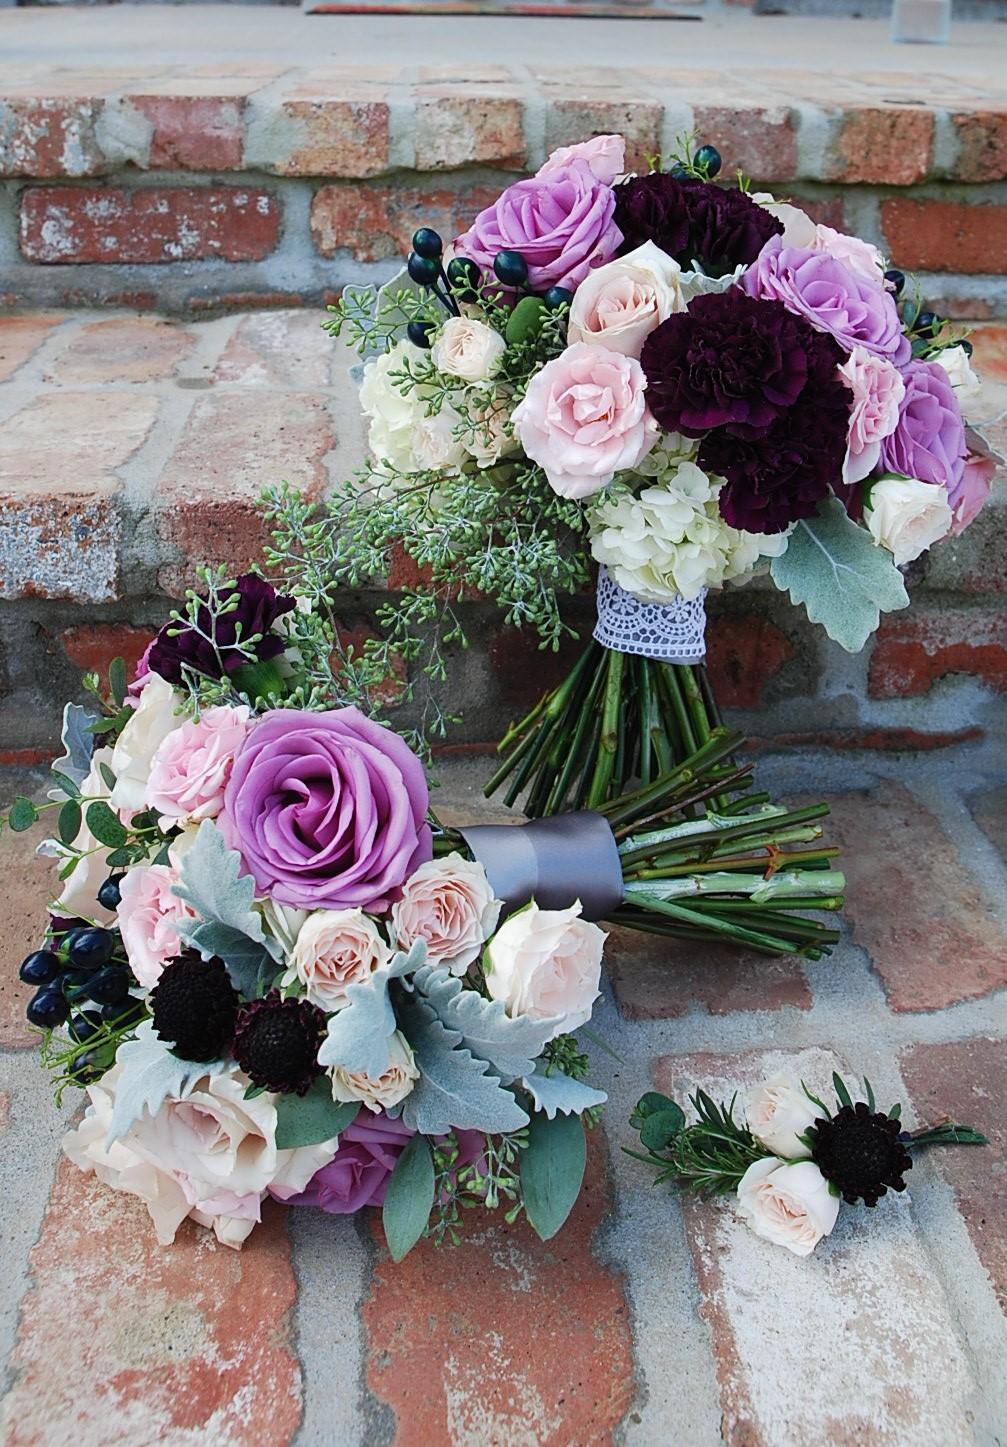 Hanna's Wedding flowers